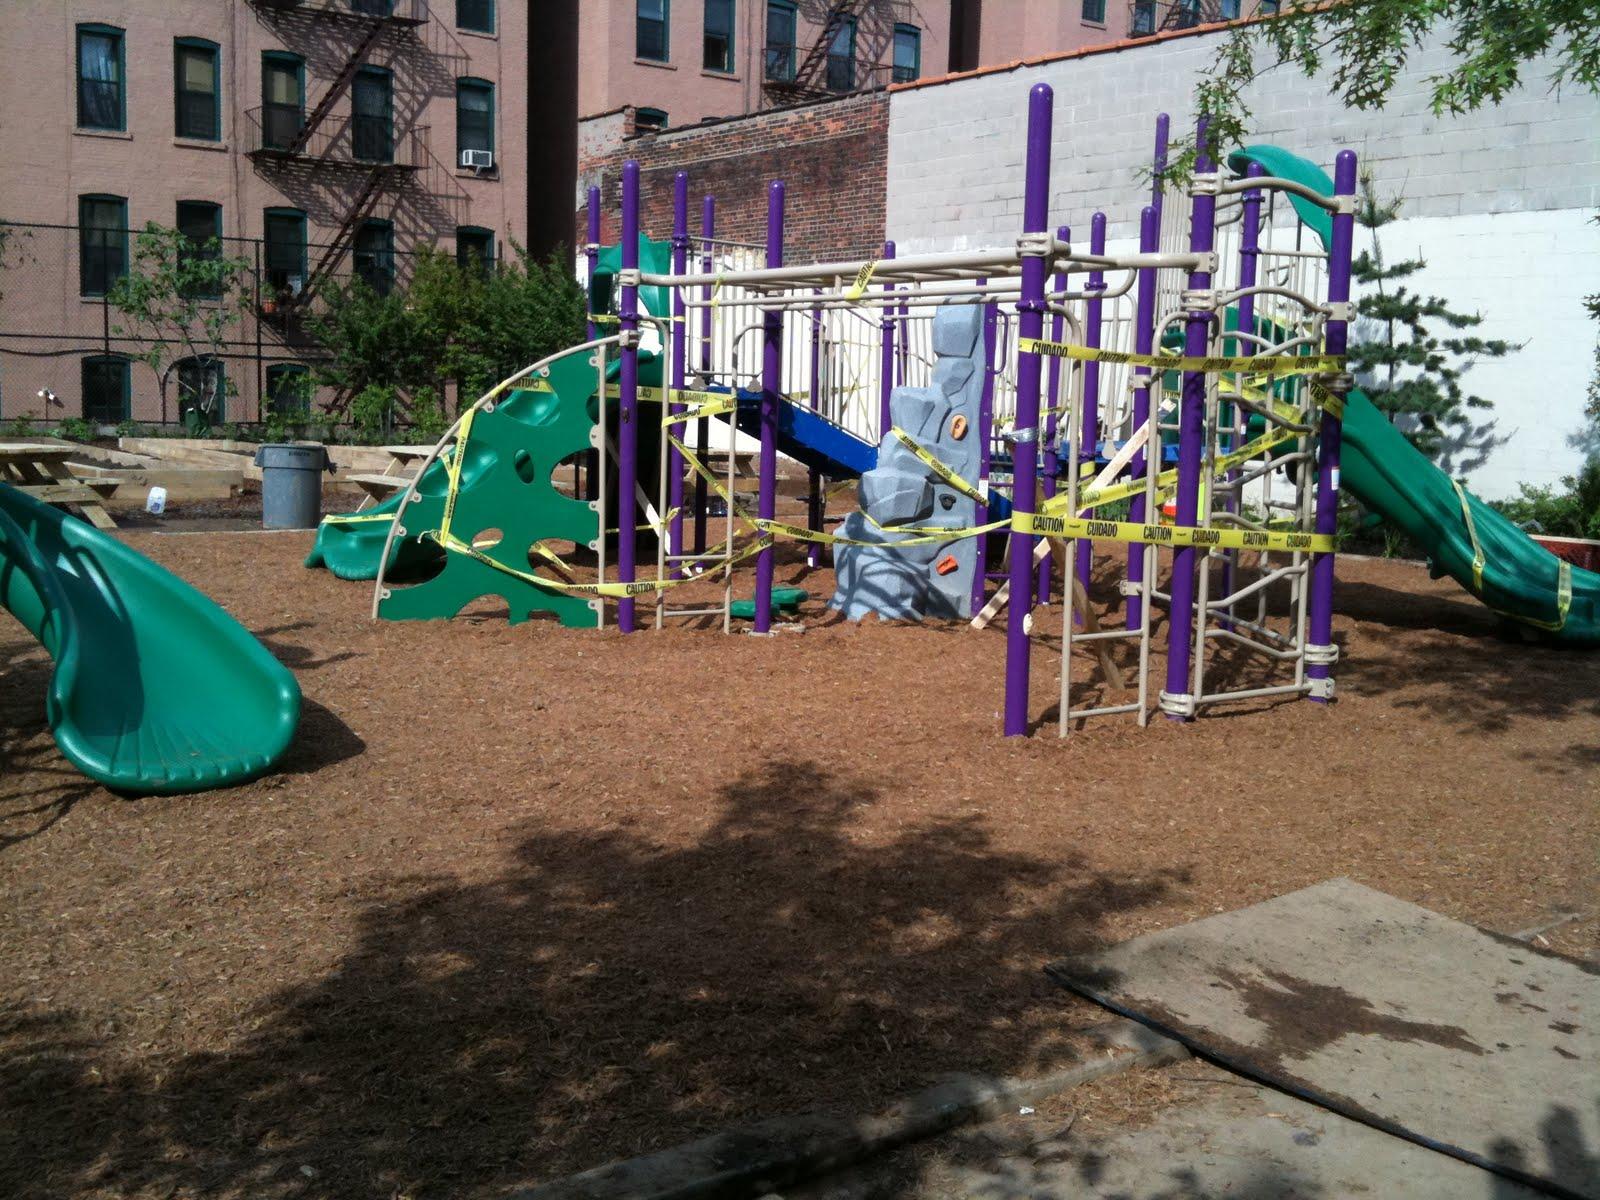 H A R L E M + B E S P O K E: ☞ WALK: The East 103rd Garden Renovation